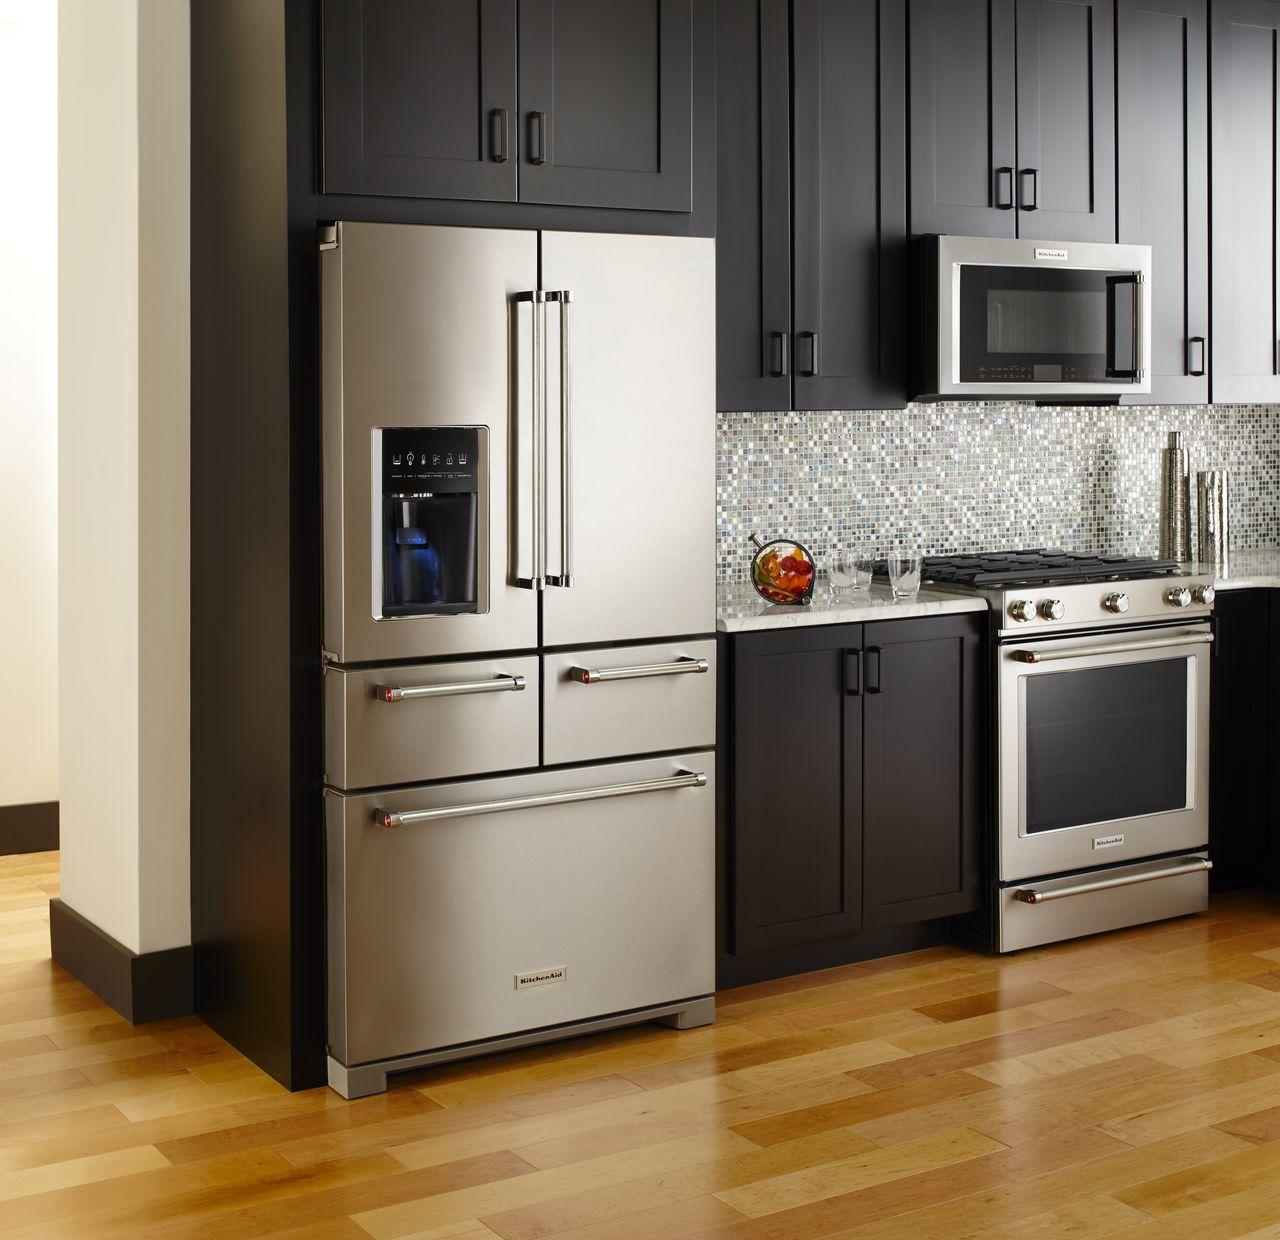 Kitchen Aid 5-Door Refrigerator